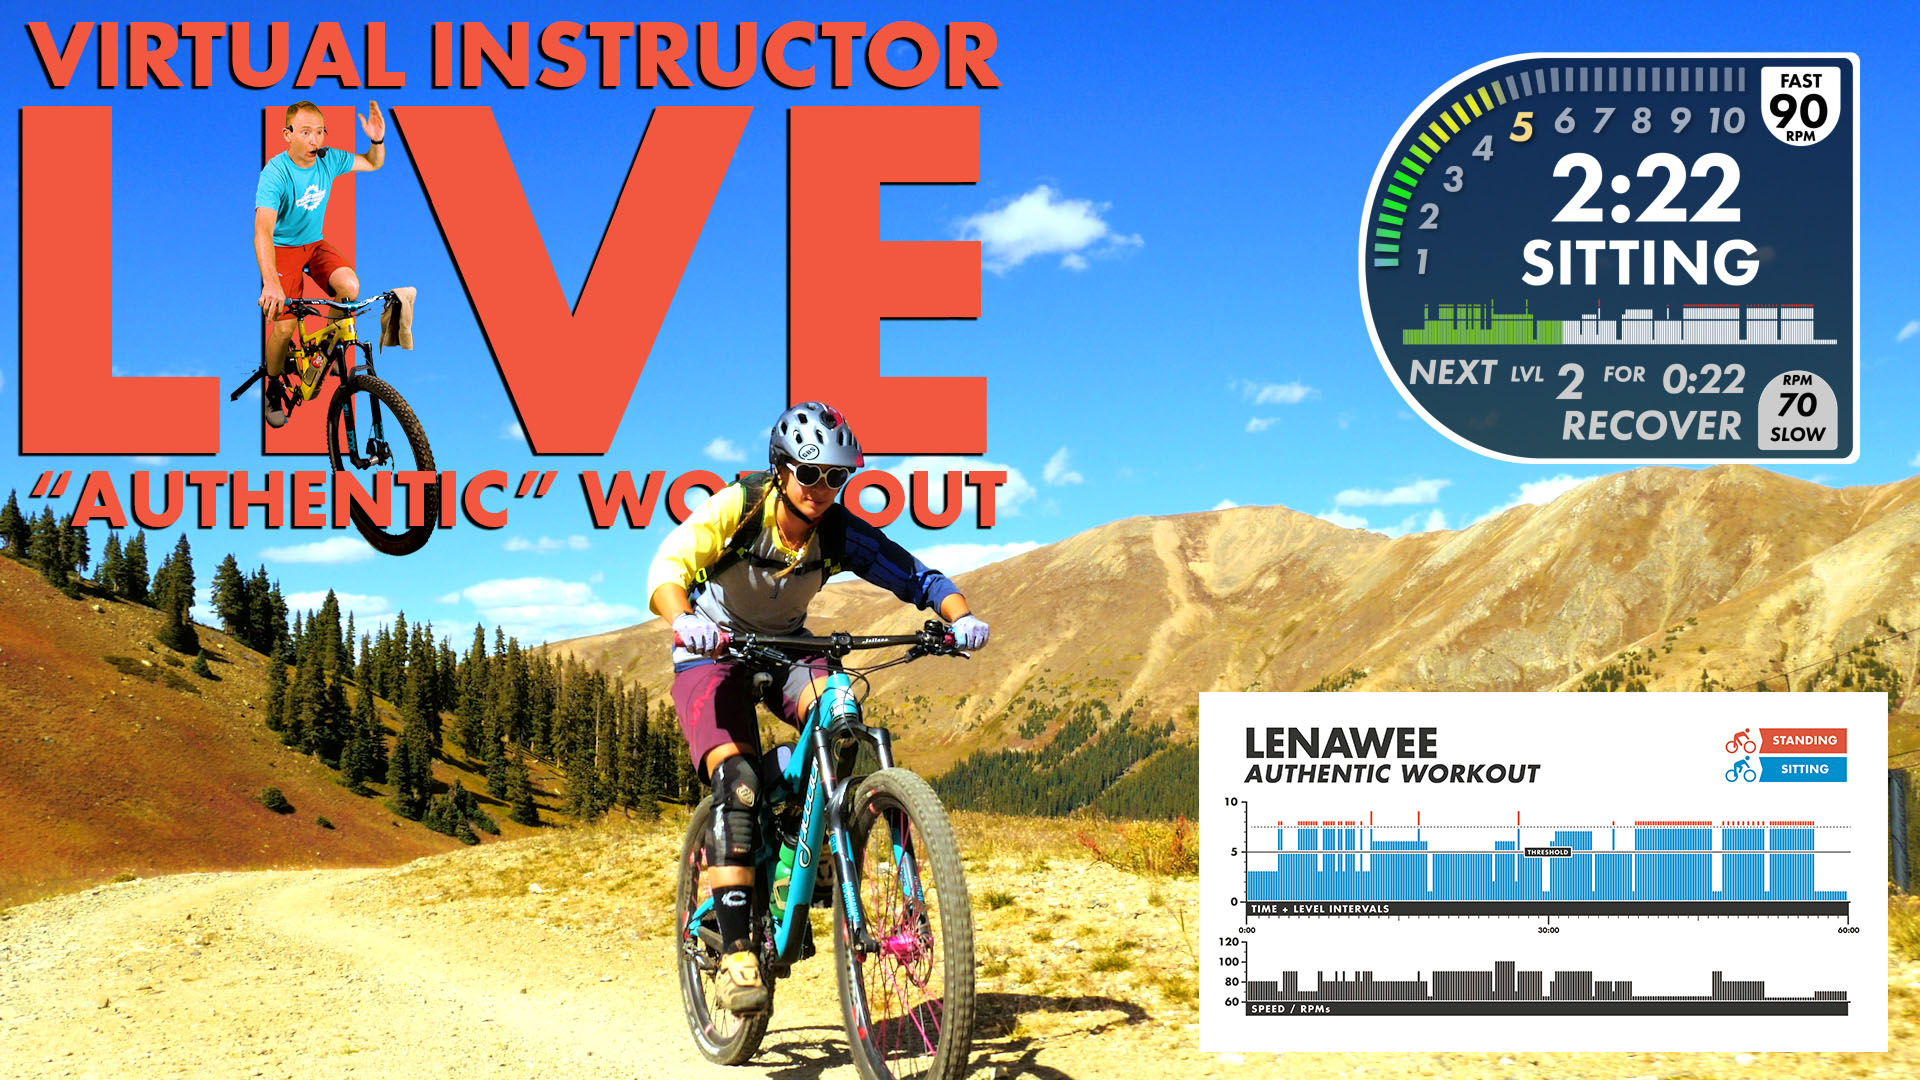 Thumbnail Lenawee AUTHENTIC Virtual Instructor.jpg